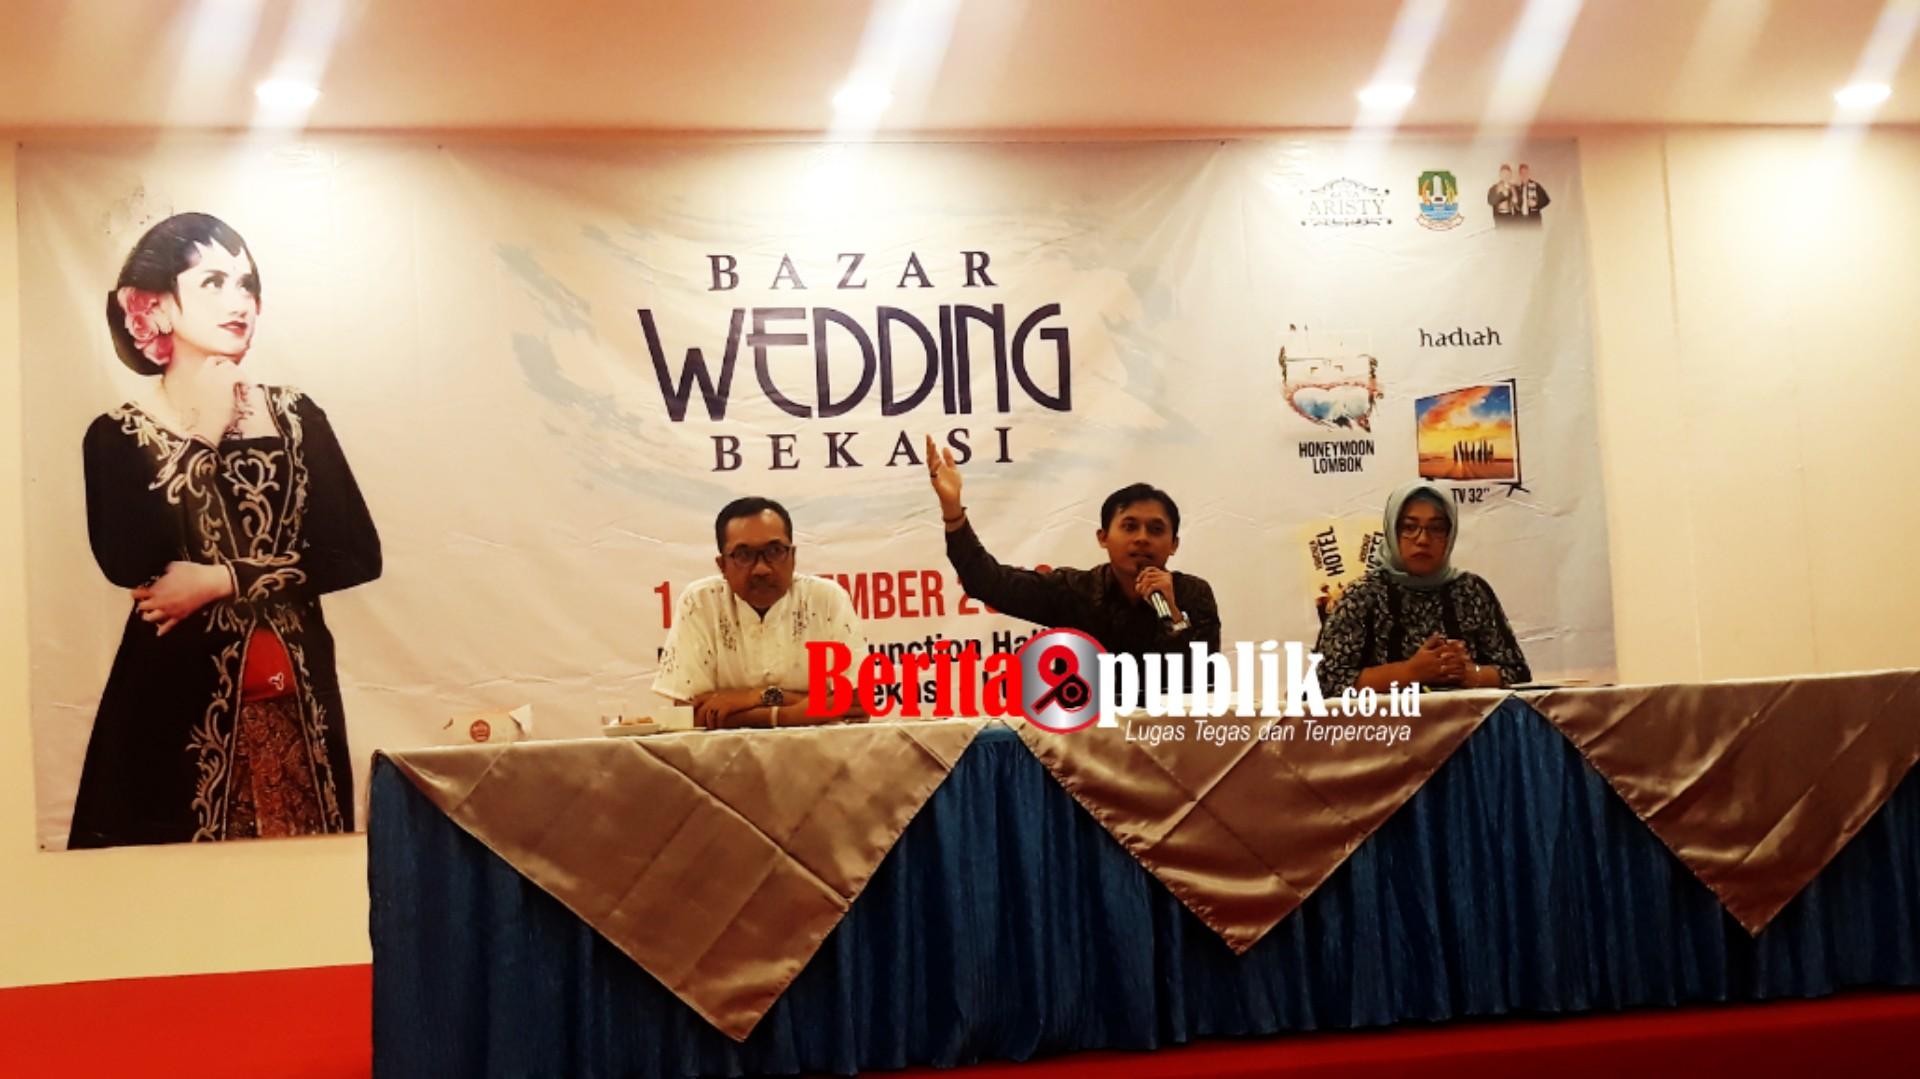 Konferensi Pers Bazar Wedding Bekasi CV Aristy bersama Pemkot Bekasi dan Penyelenggara Grand Mall berlokasi di De'Krandjie Function Hall Grand Mall Lantai 3, Kelurahan Kranji, Kecamatan Bekasi Barat pada 1 hingga 3 November 2019.